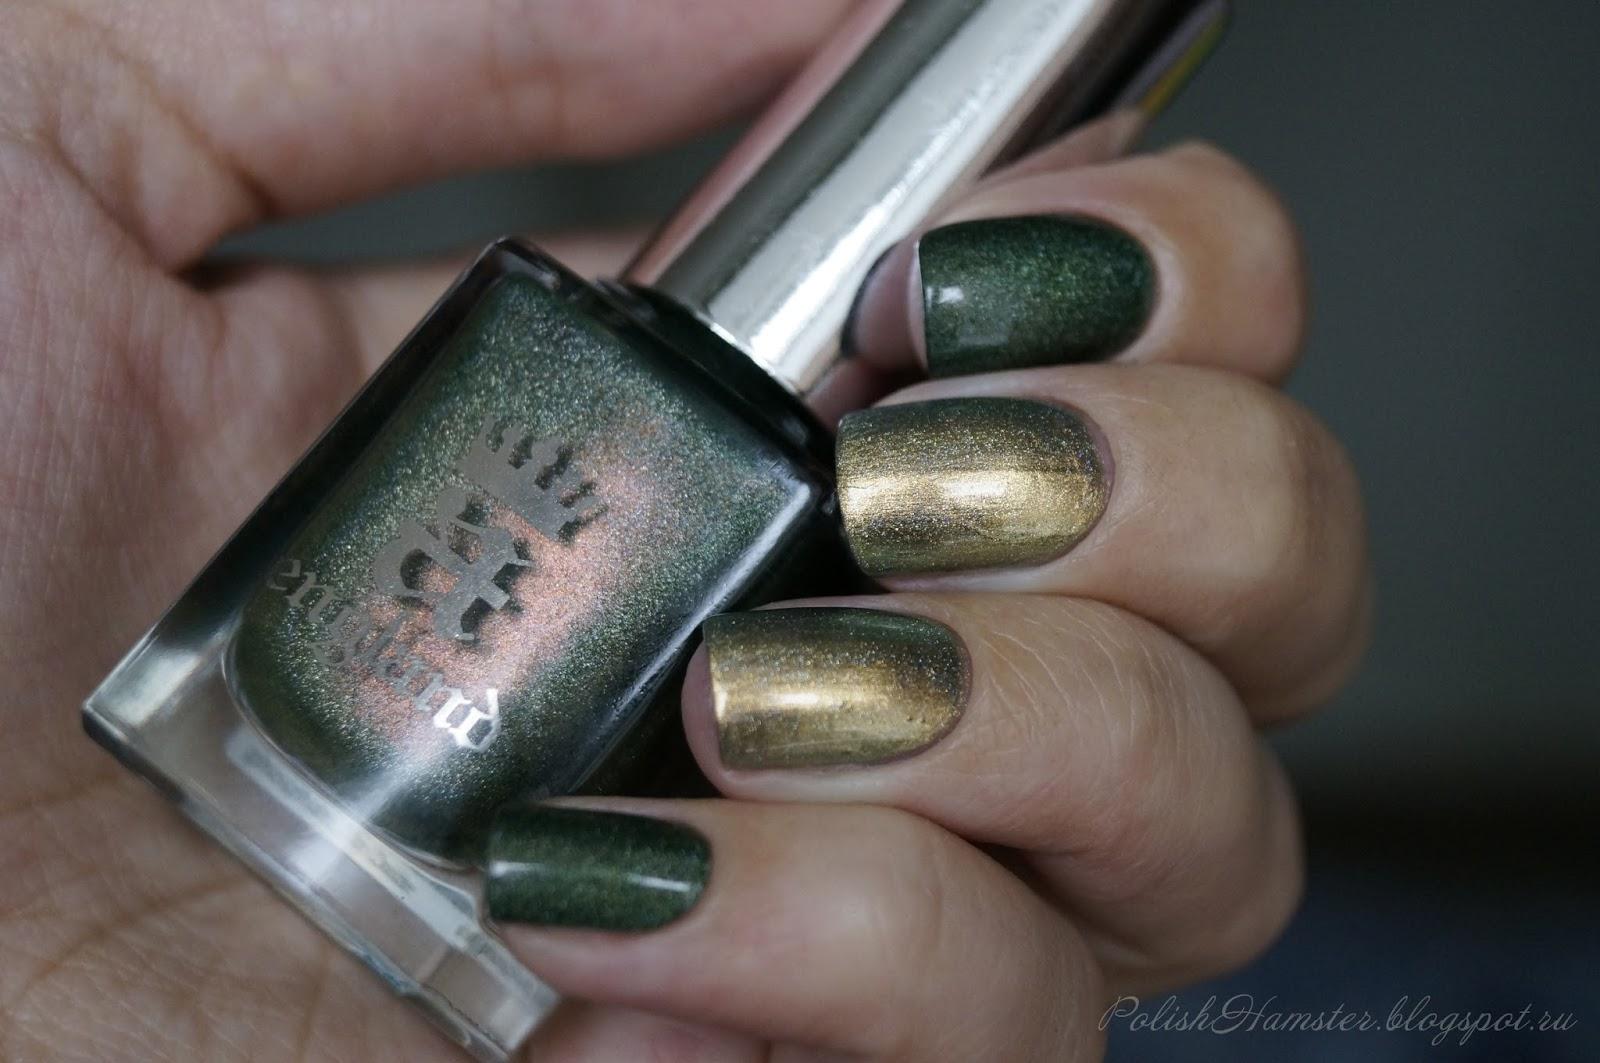 A-England Dragon, Eva Mosaic 153, KBShimmer Prism break